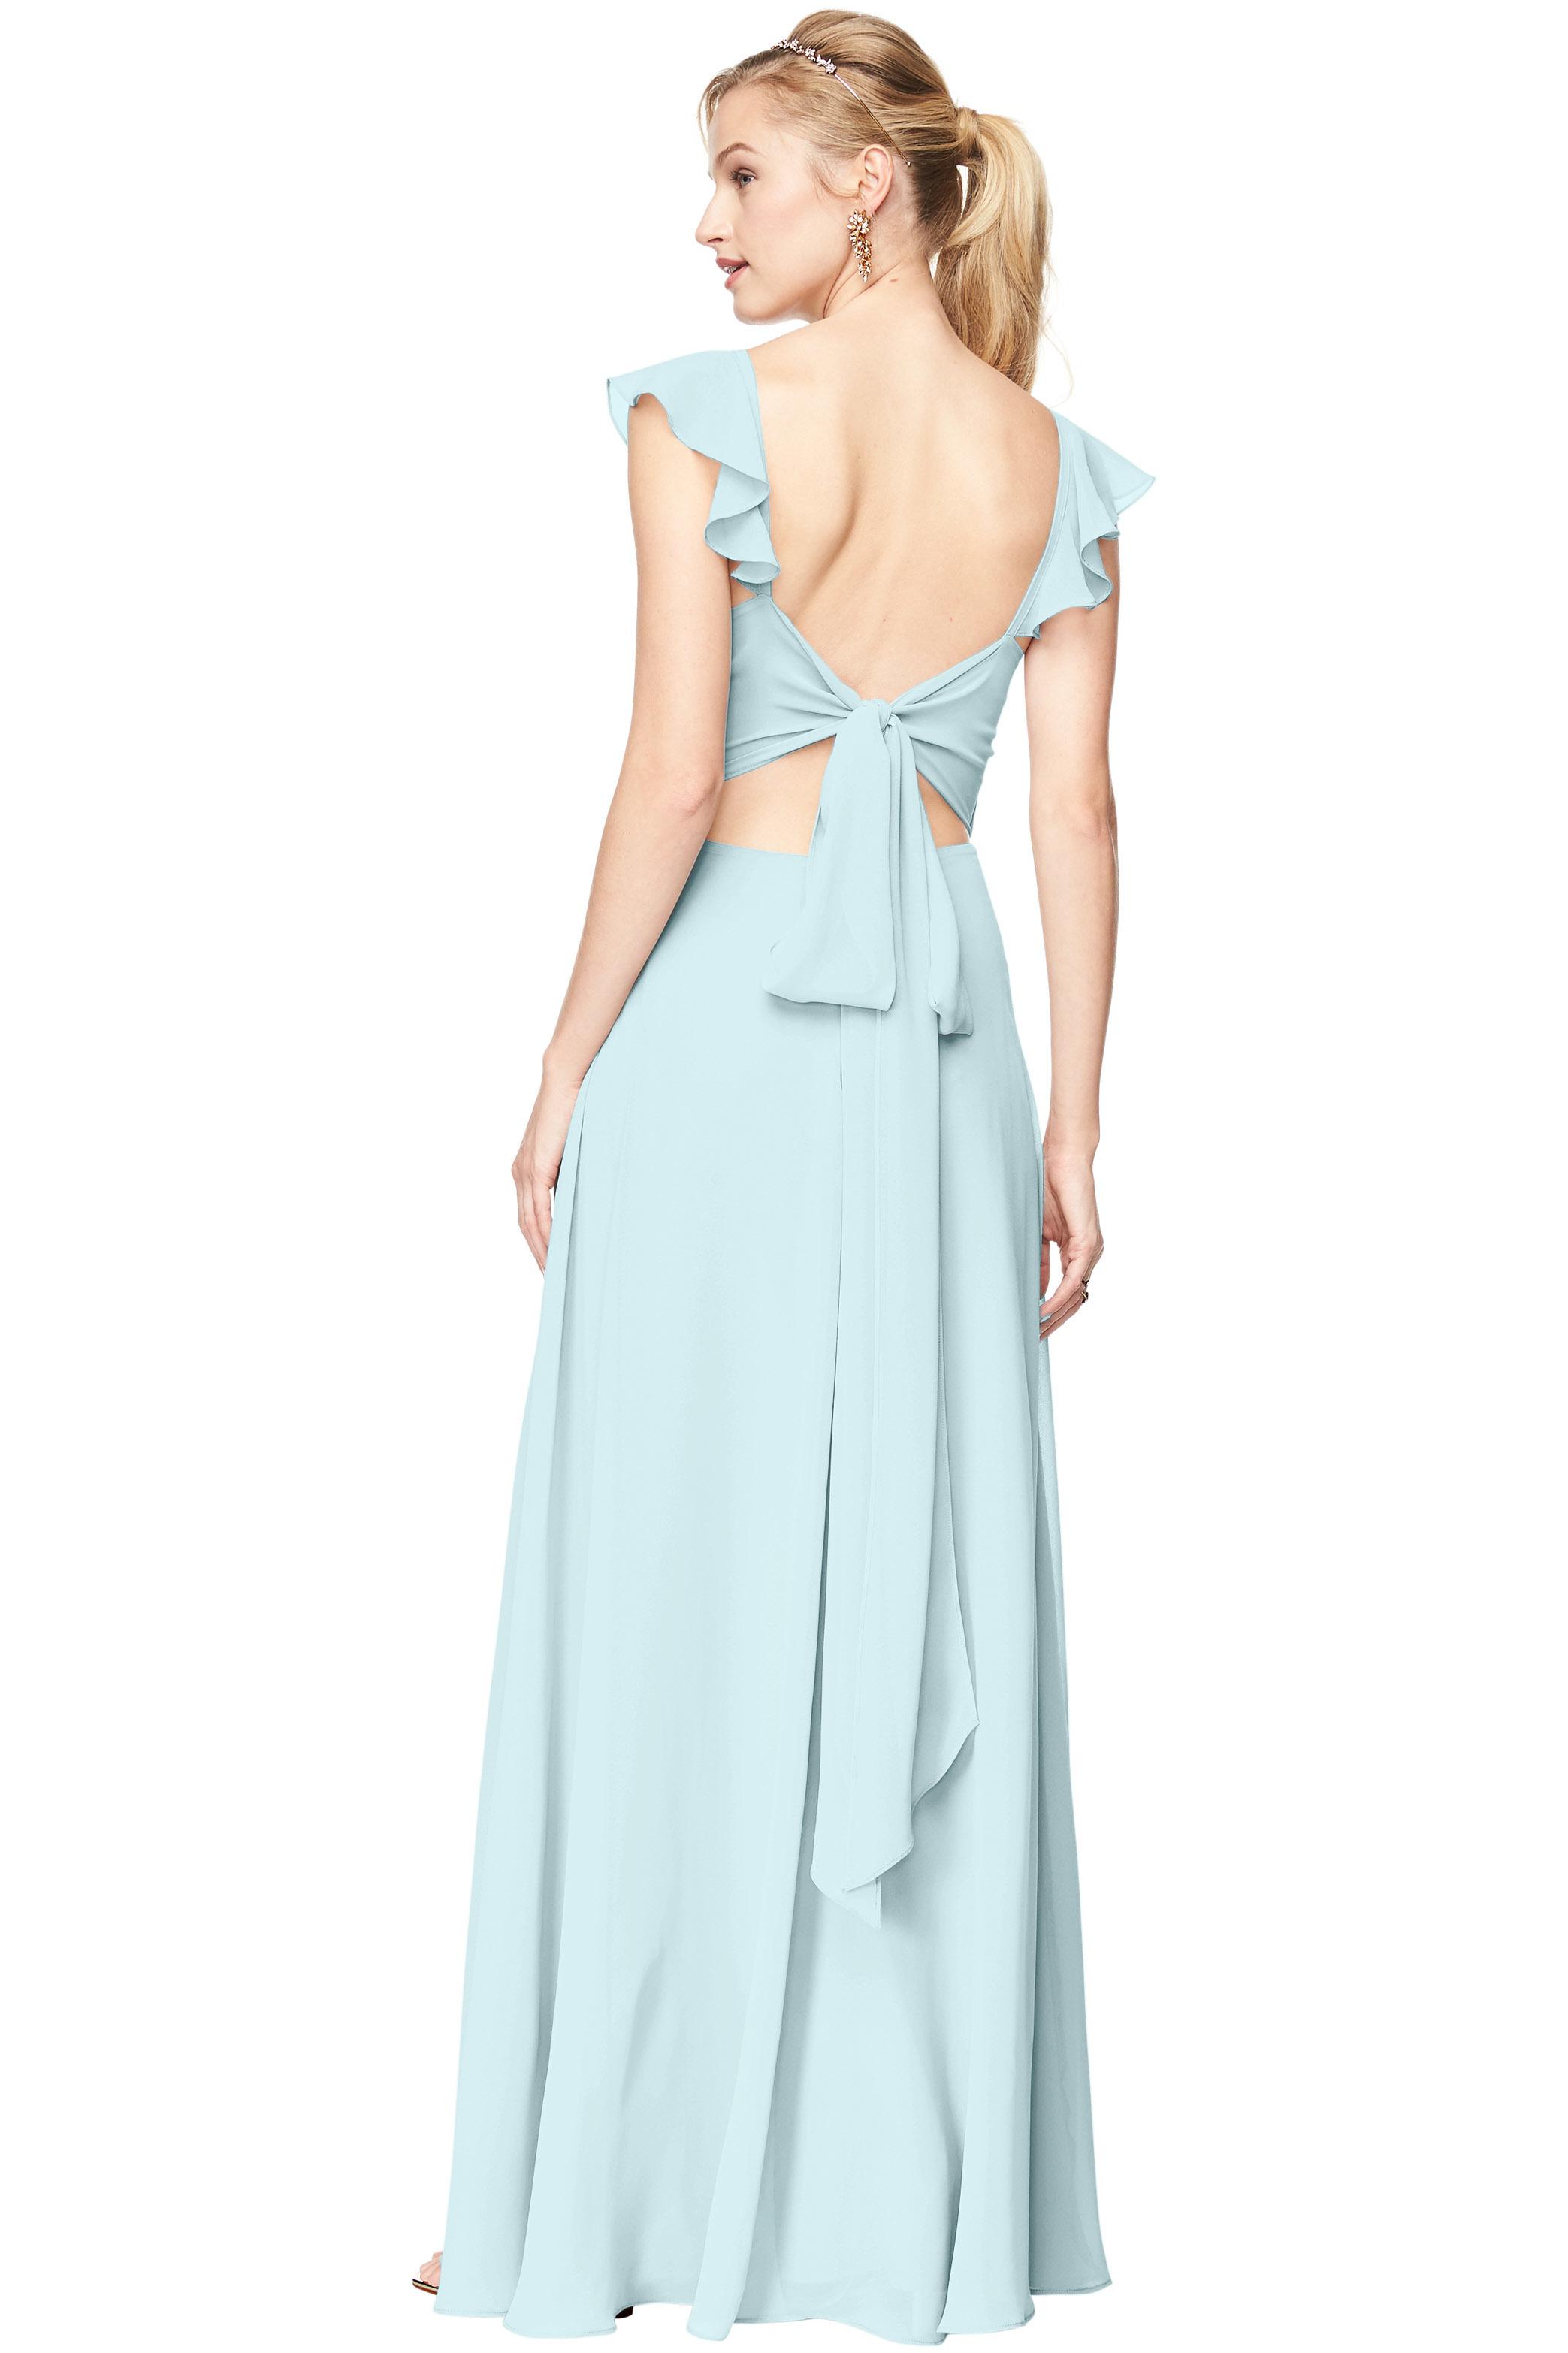 Bill Levkoff PALE BLUE Chiffon V-Neck, Cap Sleeve A-line gown, $198.00 Back